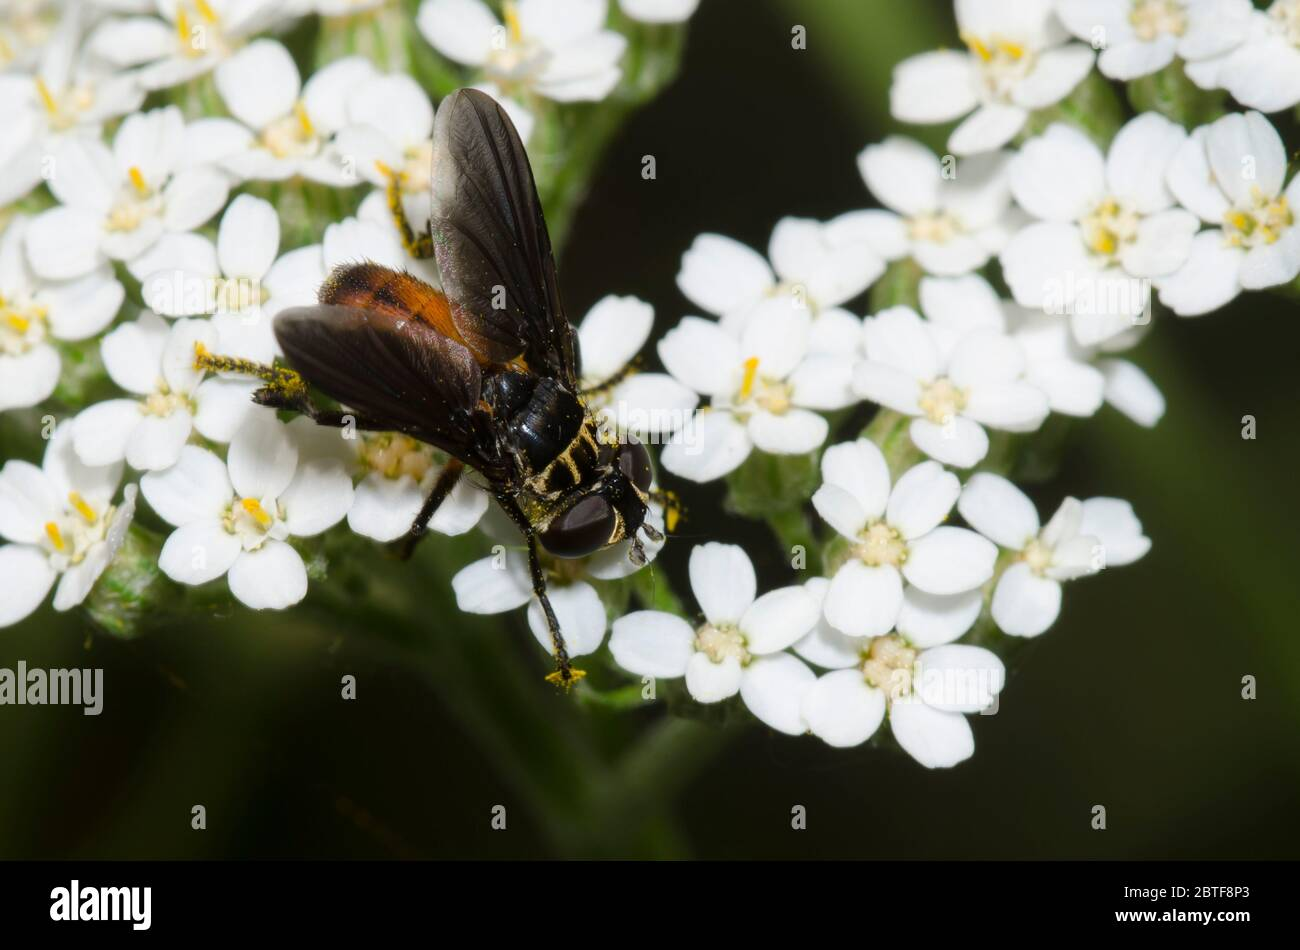 Feather-legged Fly, Trichopoda sp., foraging on yarrow, Achillea millefolium Stock Photo